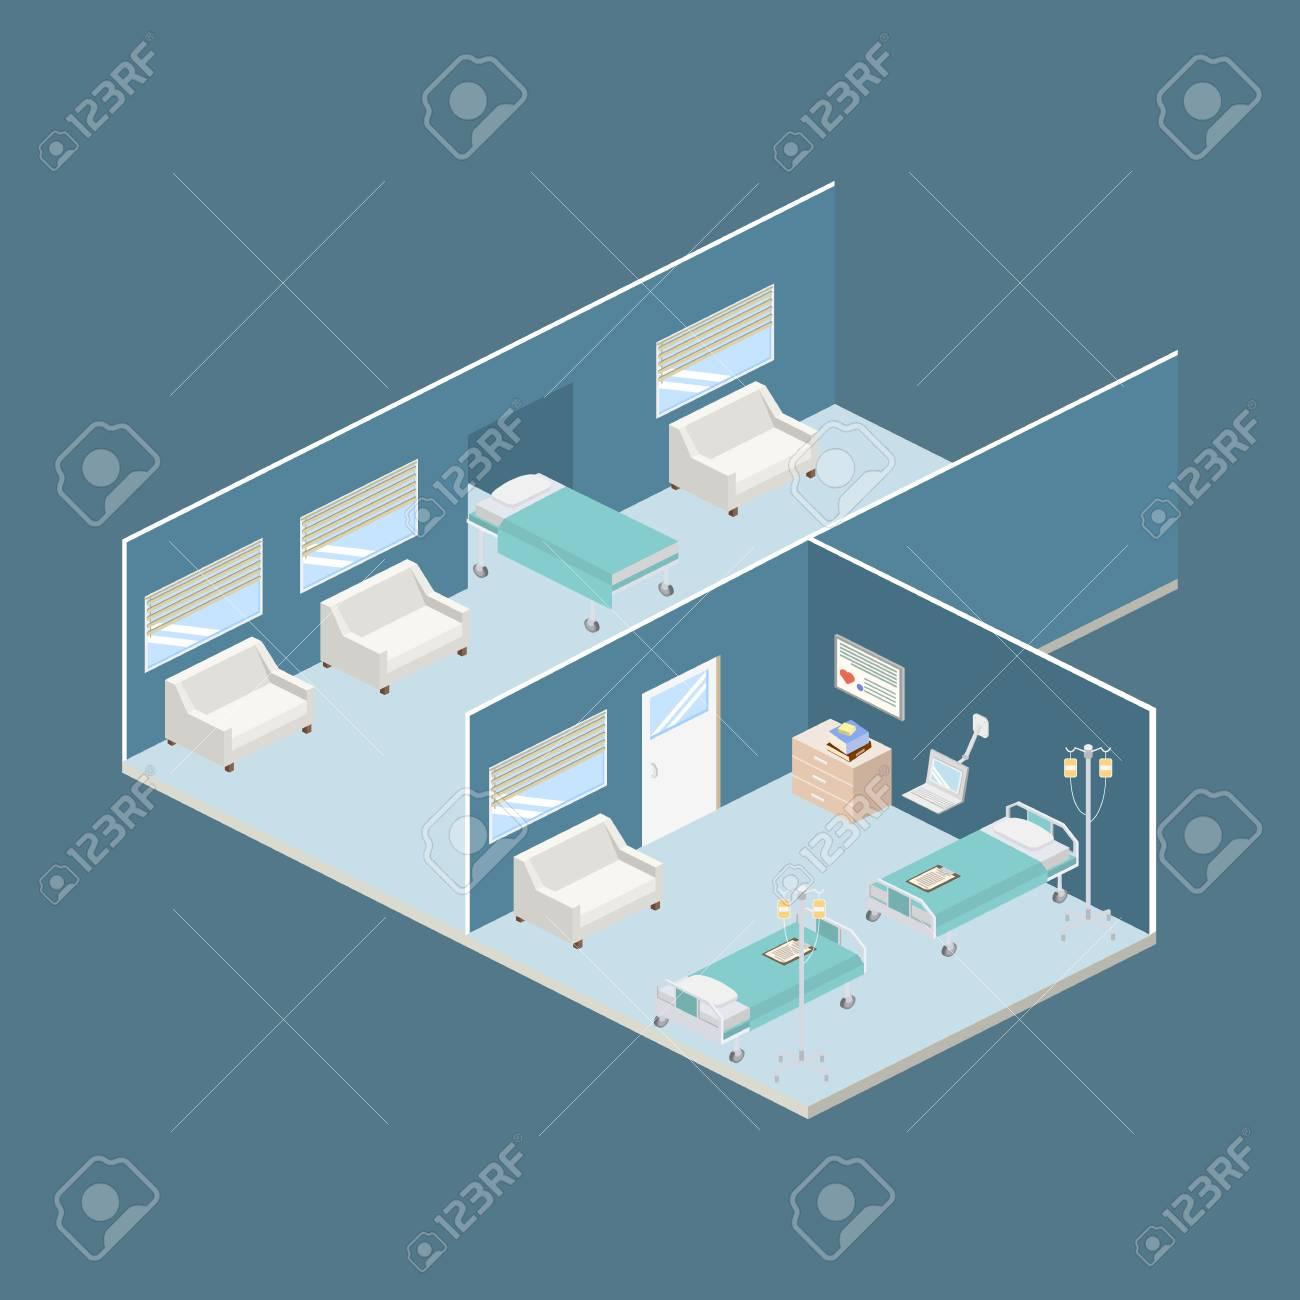 Isometric hospital design interior vector illustration 3D